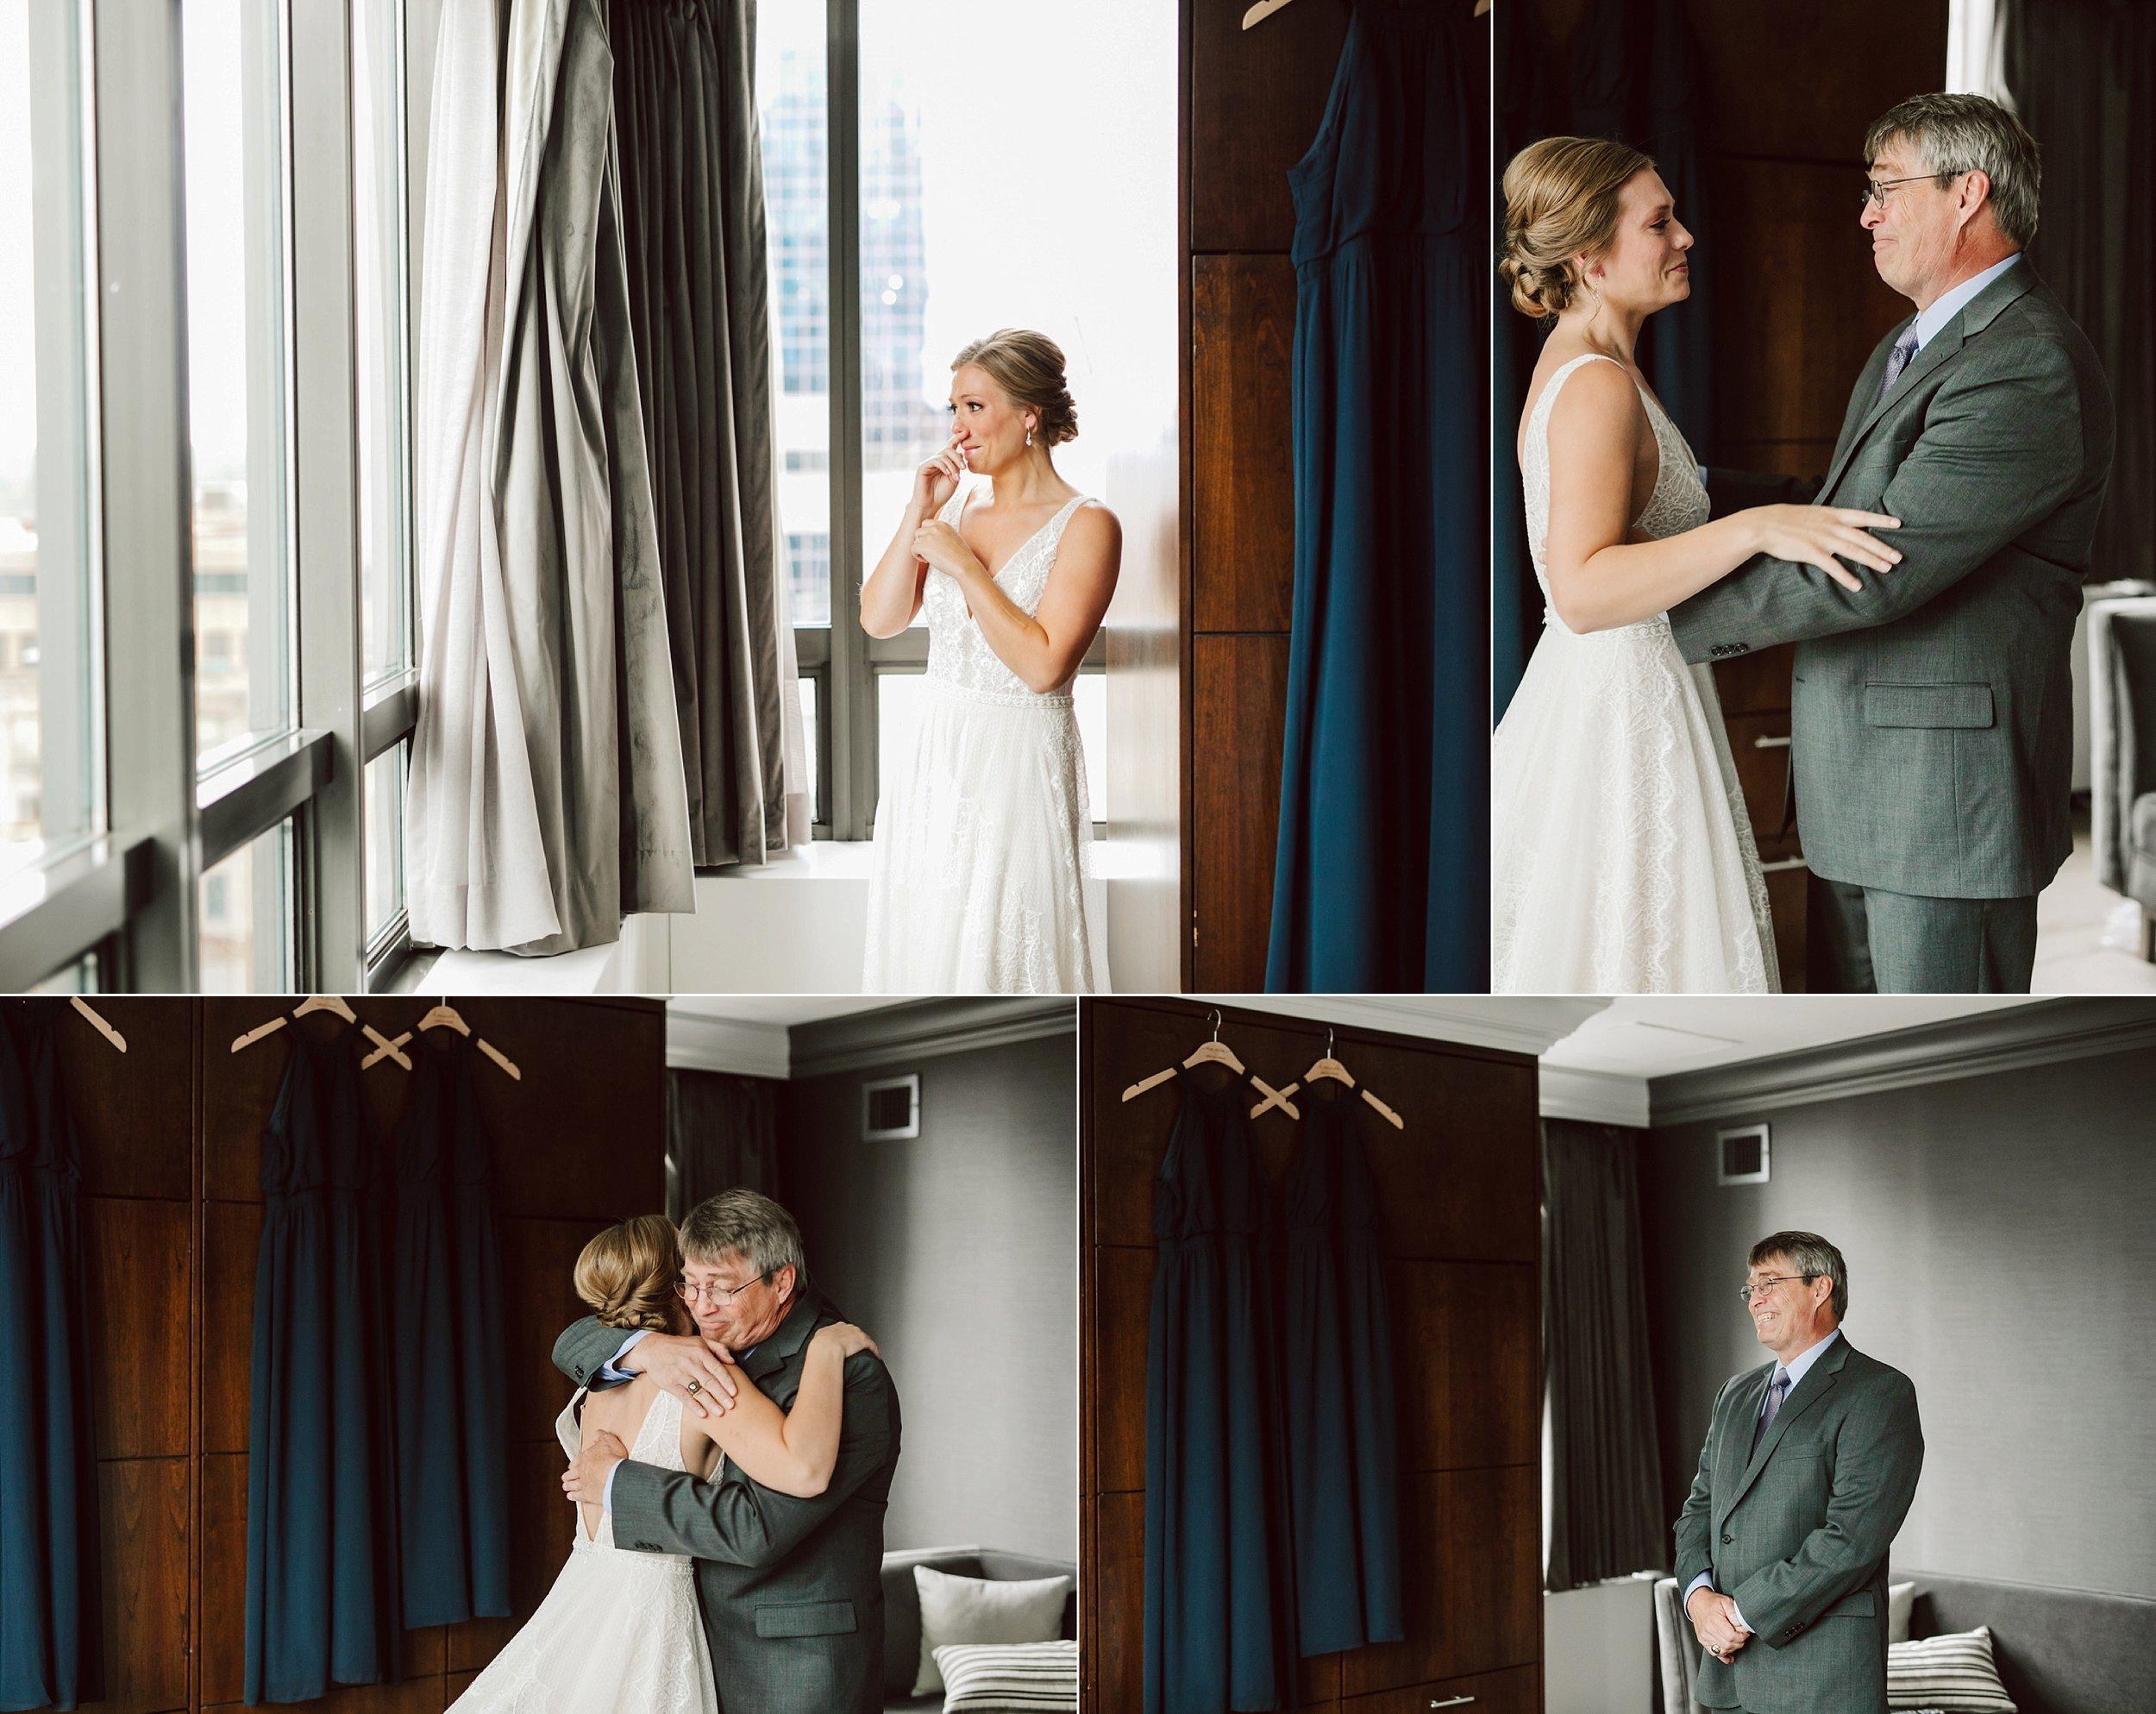 Nicollet-Island-Pavilion-Minneapolis-September-Coral-Navy-Wedding-1210.jpg